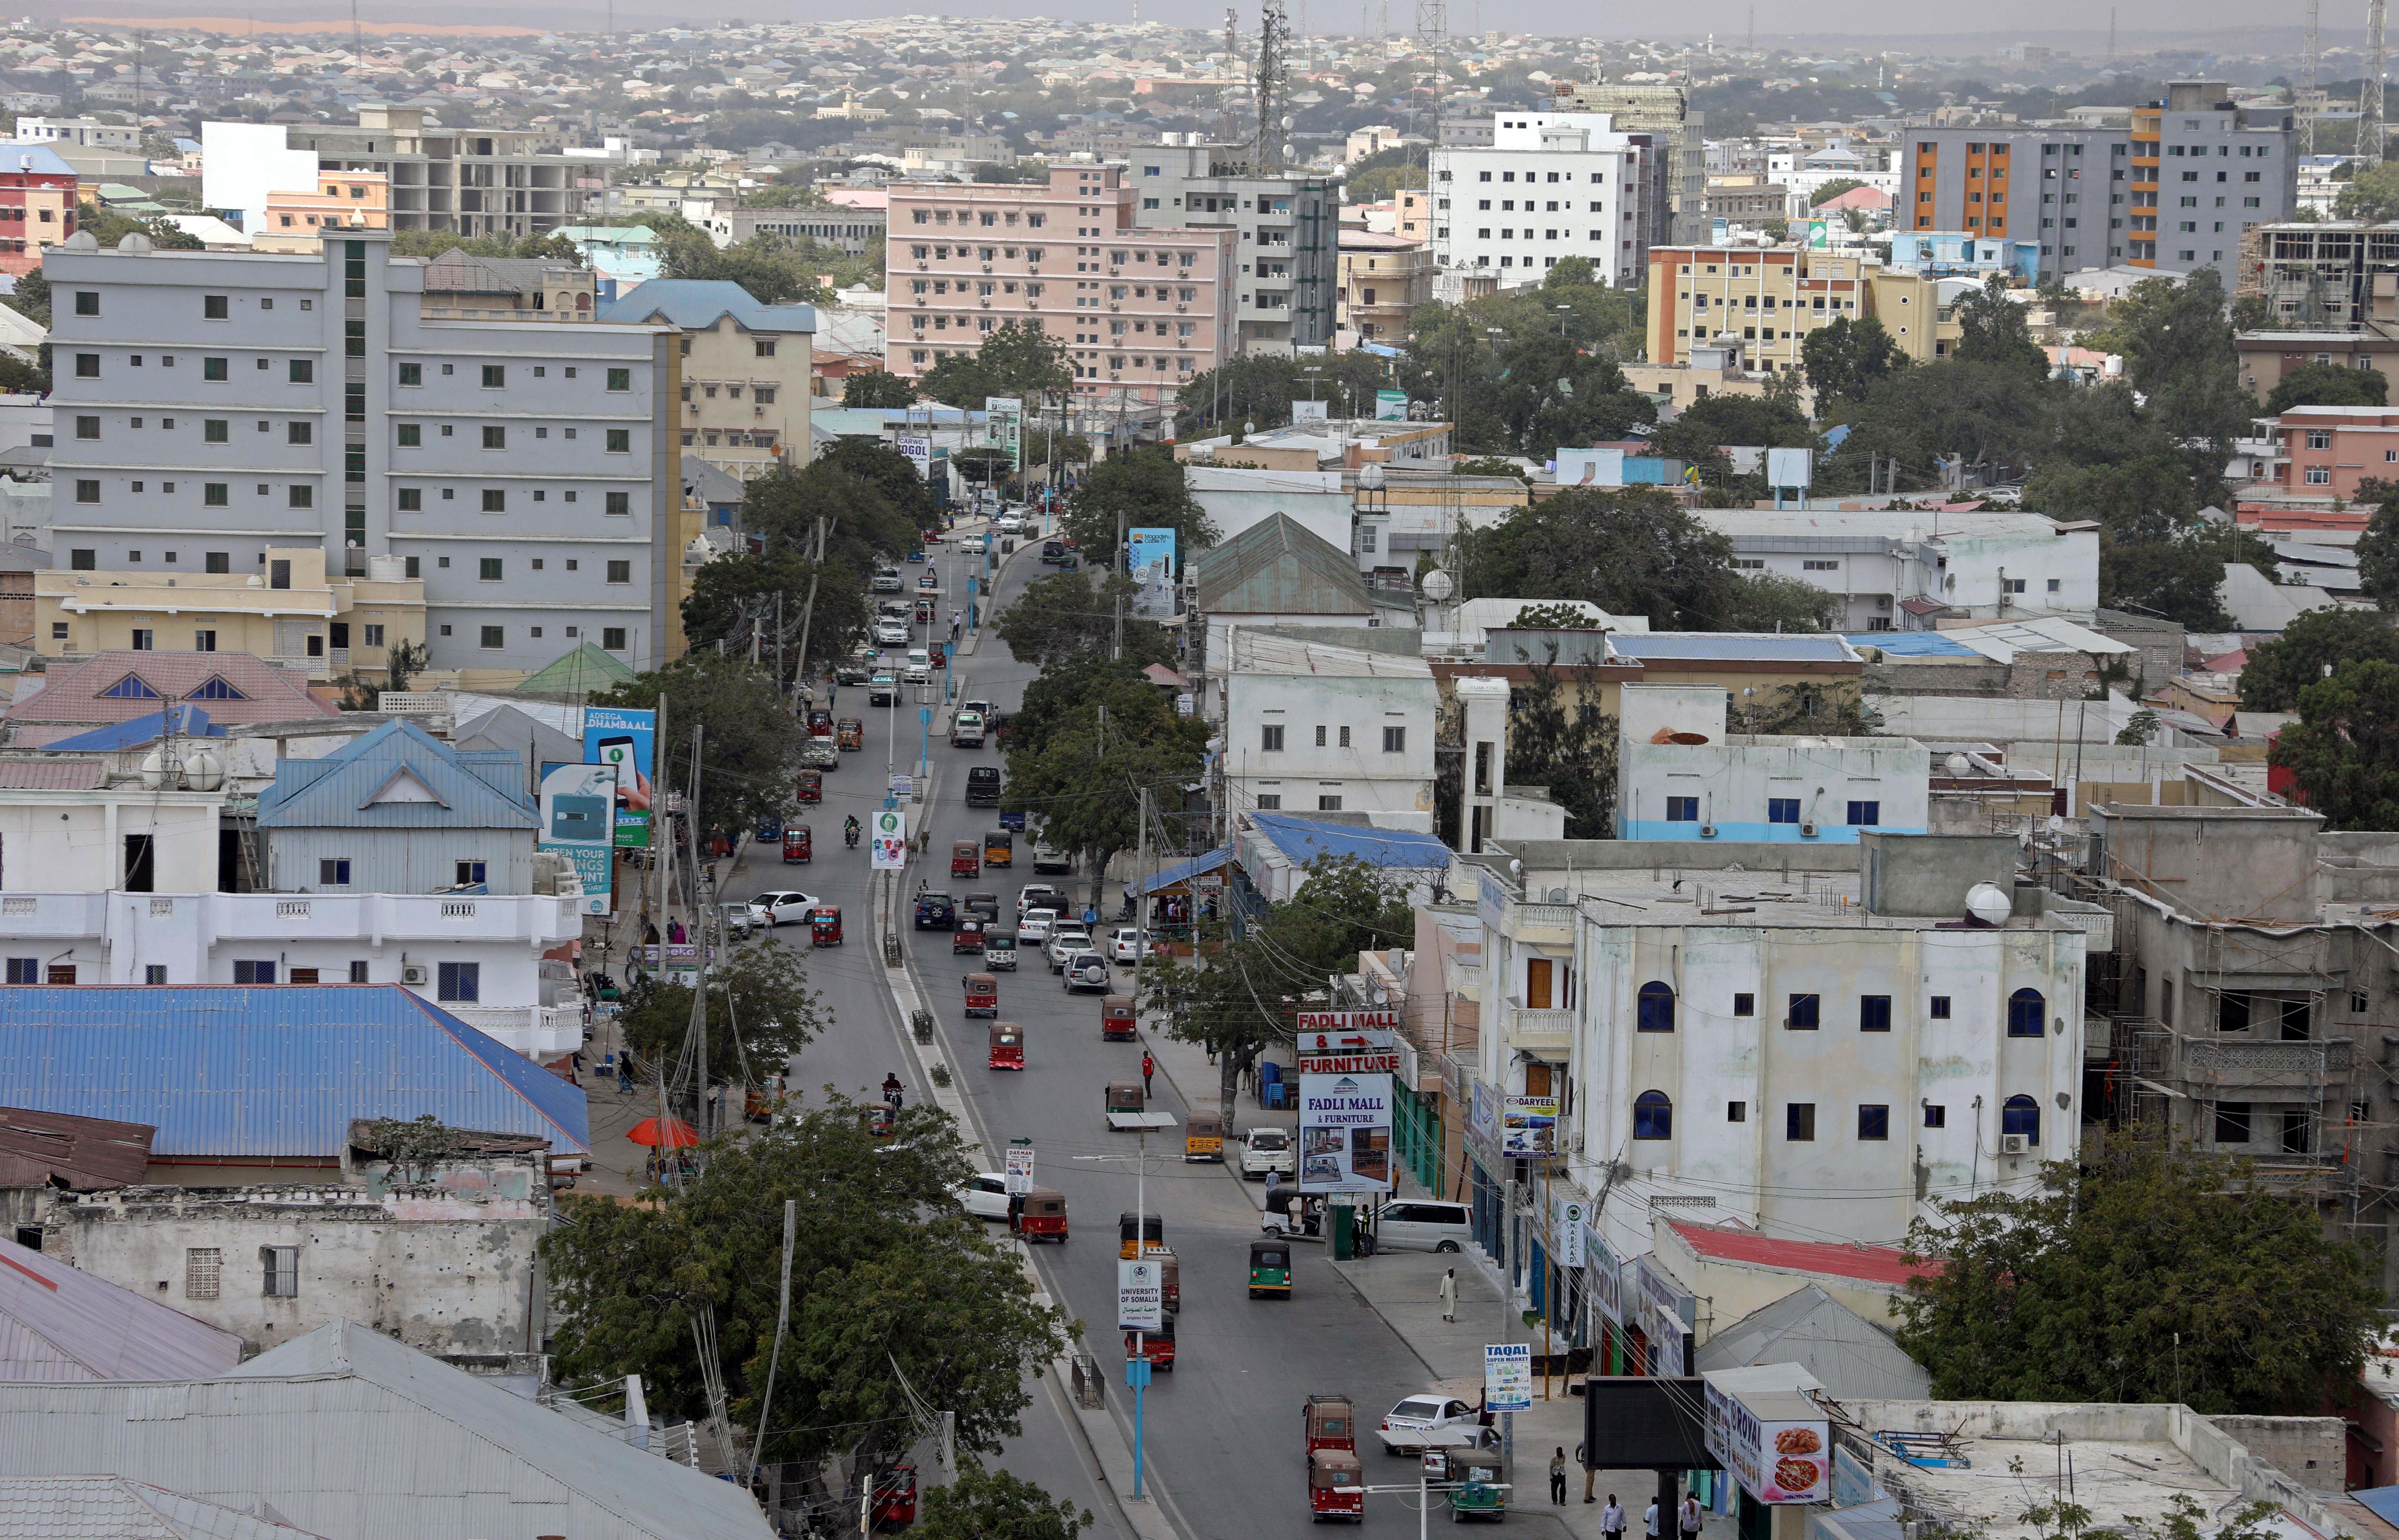 An aerial view shows rickshaw traffic in the downtown of Mogadishu, Somalia February 14, 2018.